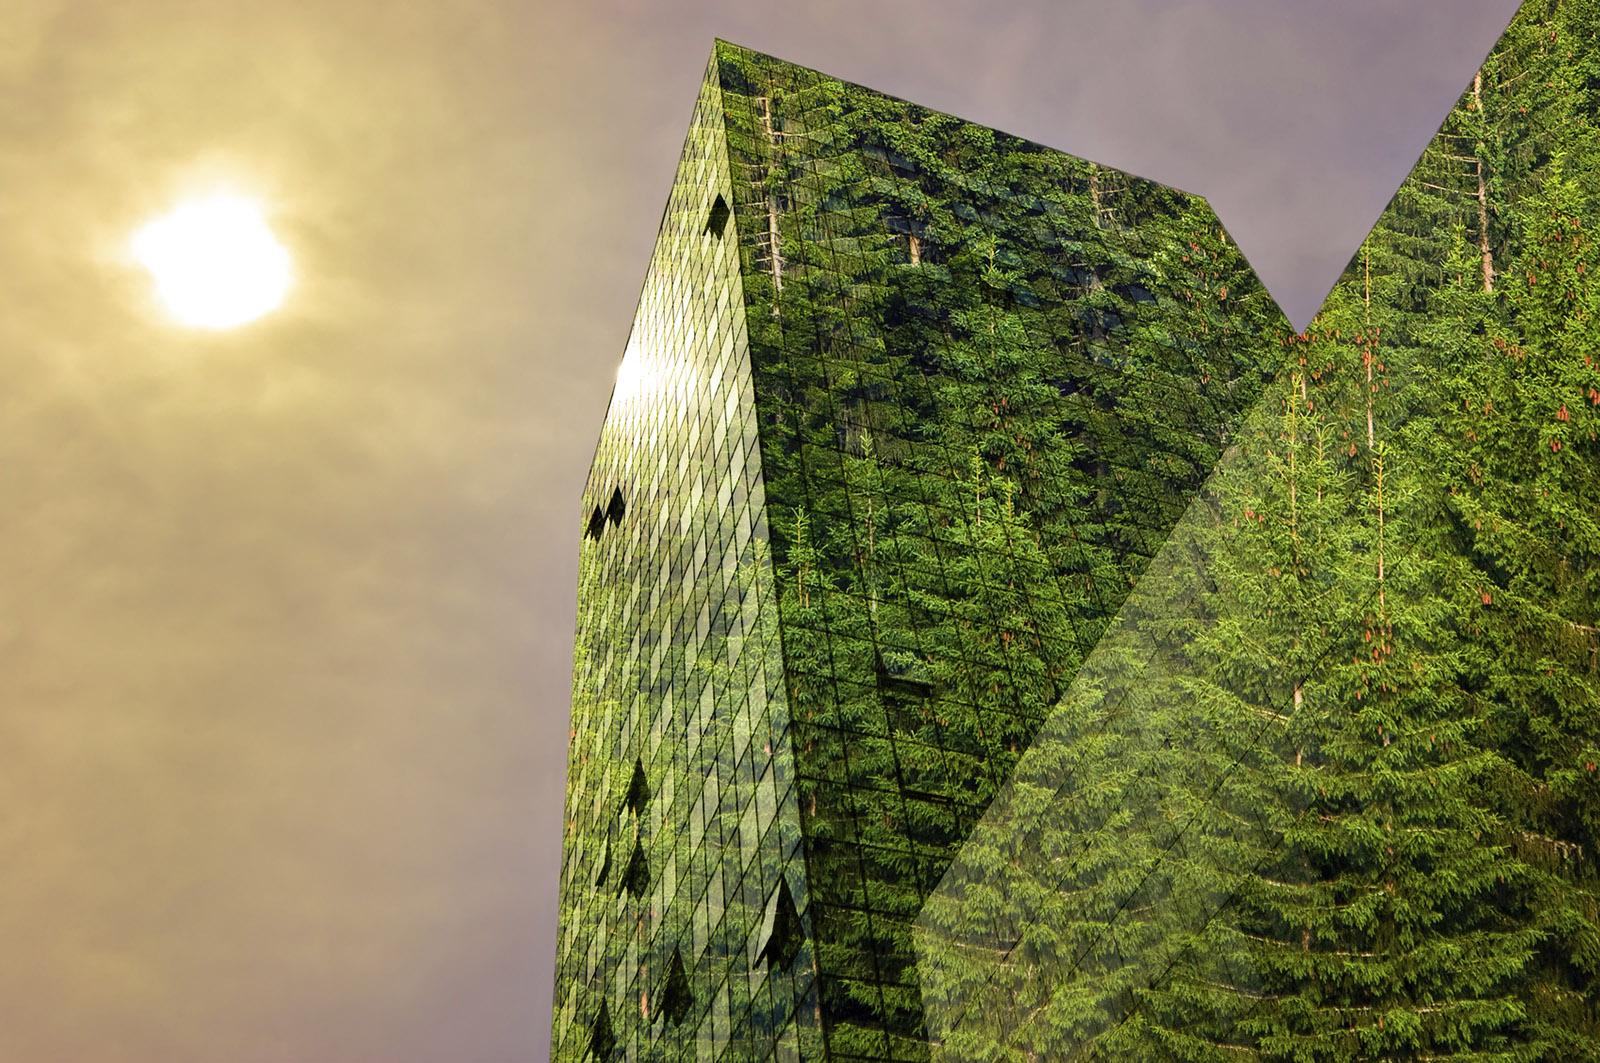 Optimised Engineered Lumber – OEL™ Reengineering the Built Environment